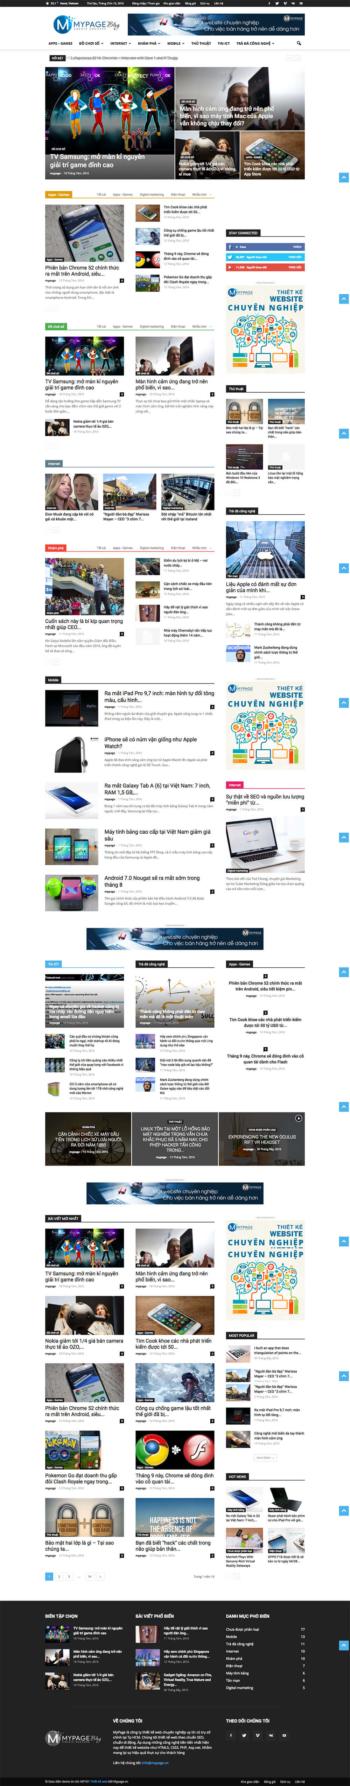 Thiết kế website tin tức Blog MP